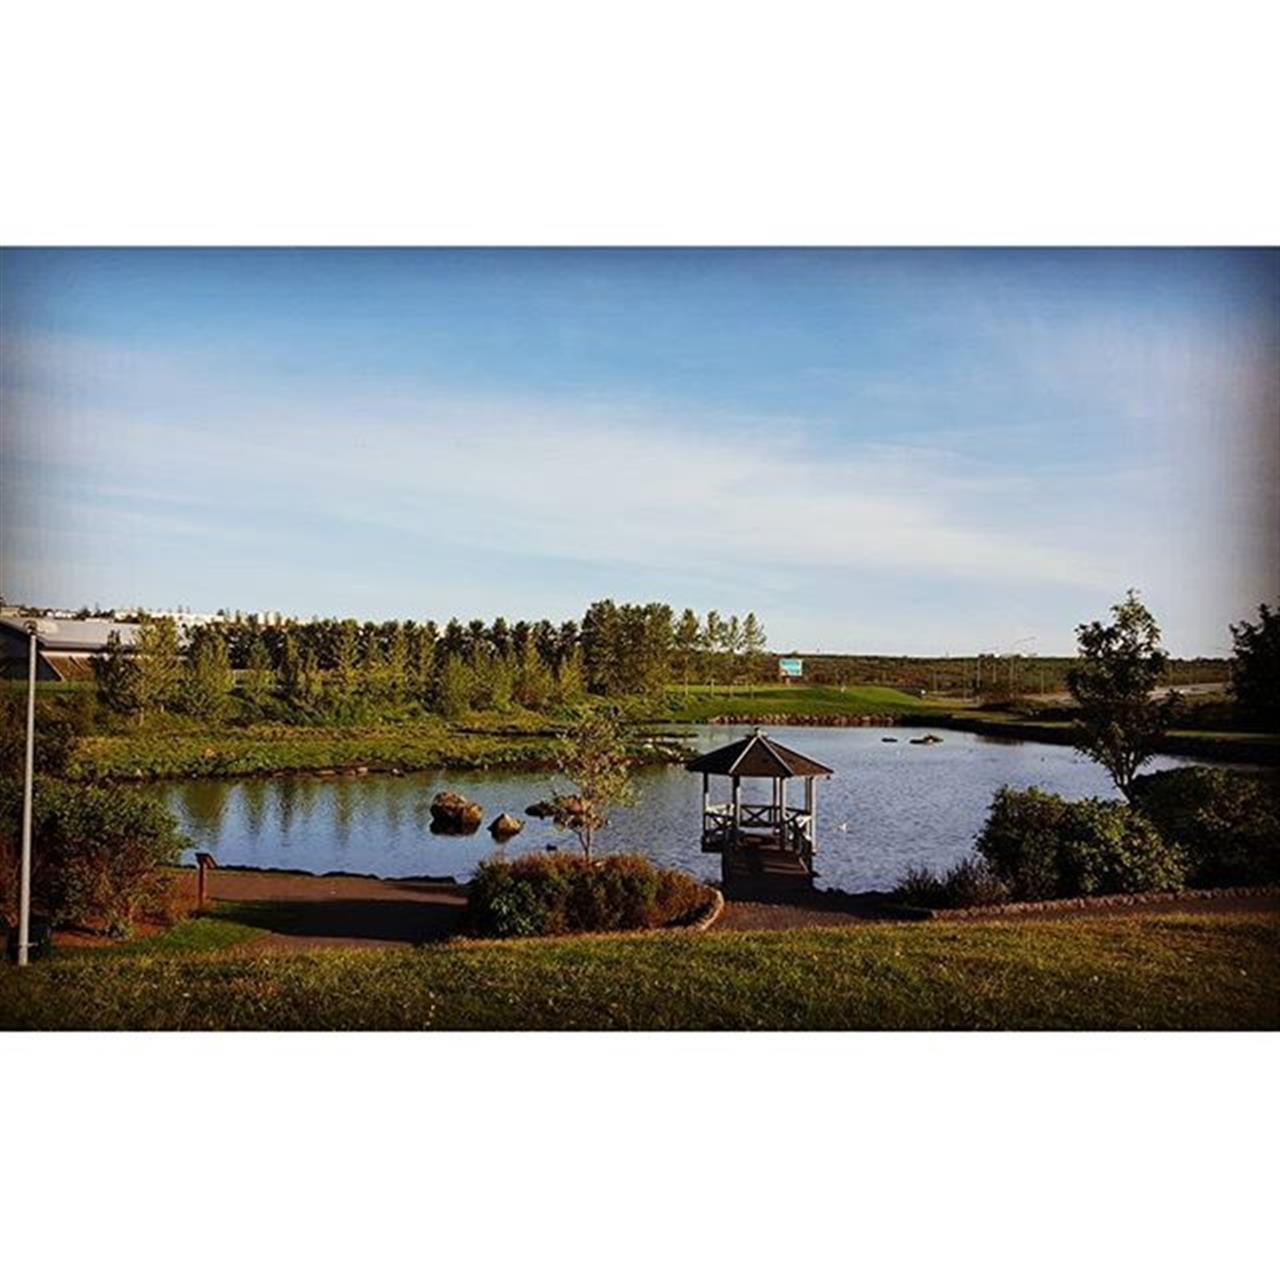 K¾pavogstj÷rni . #nature #nattura #tj÷rn #pond #water #vatn #fuglalif #birds #peace #ro #leadingrelocal #leadingre